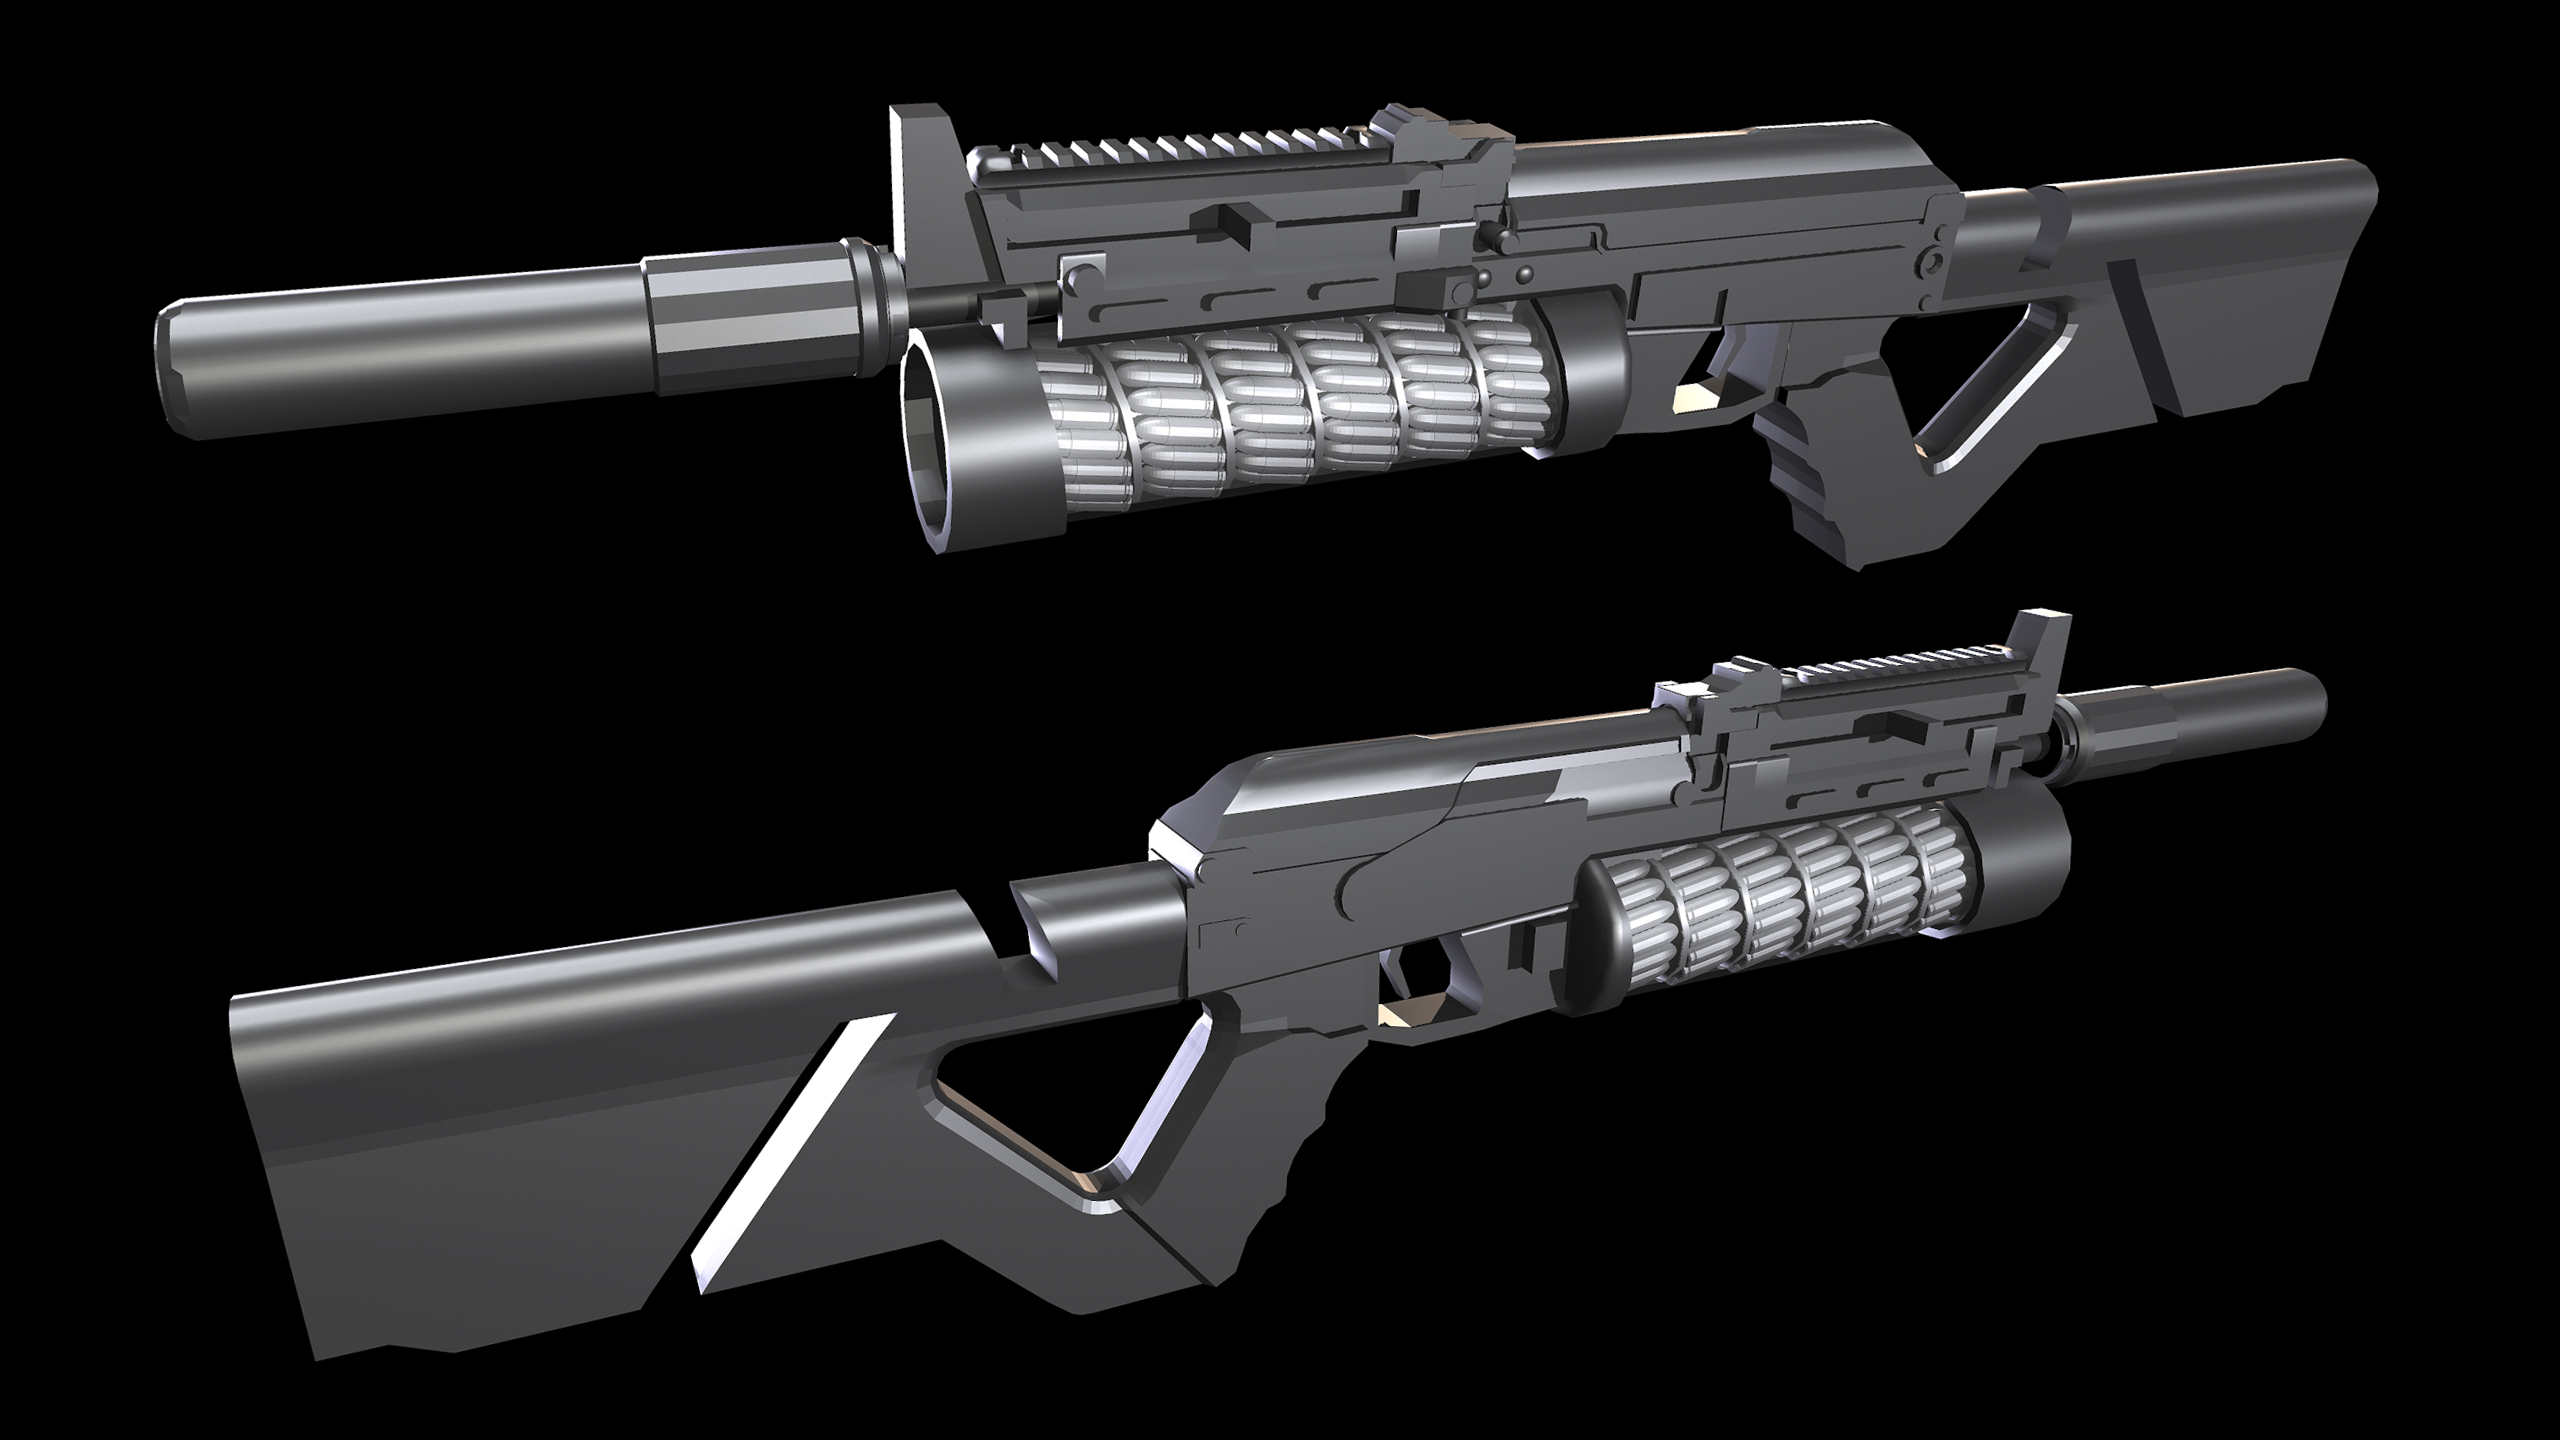 Three D Guns 2 - Bizon-IV